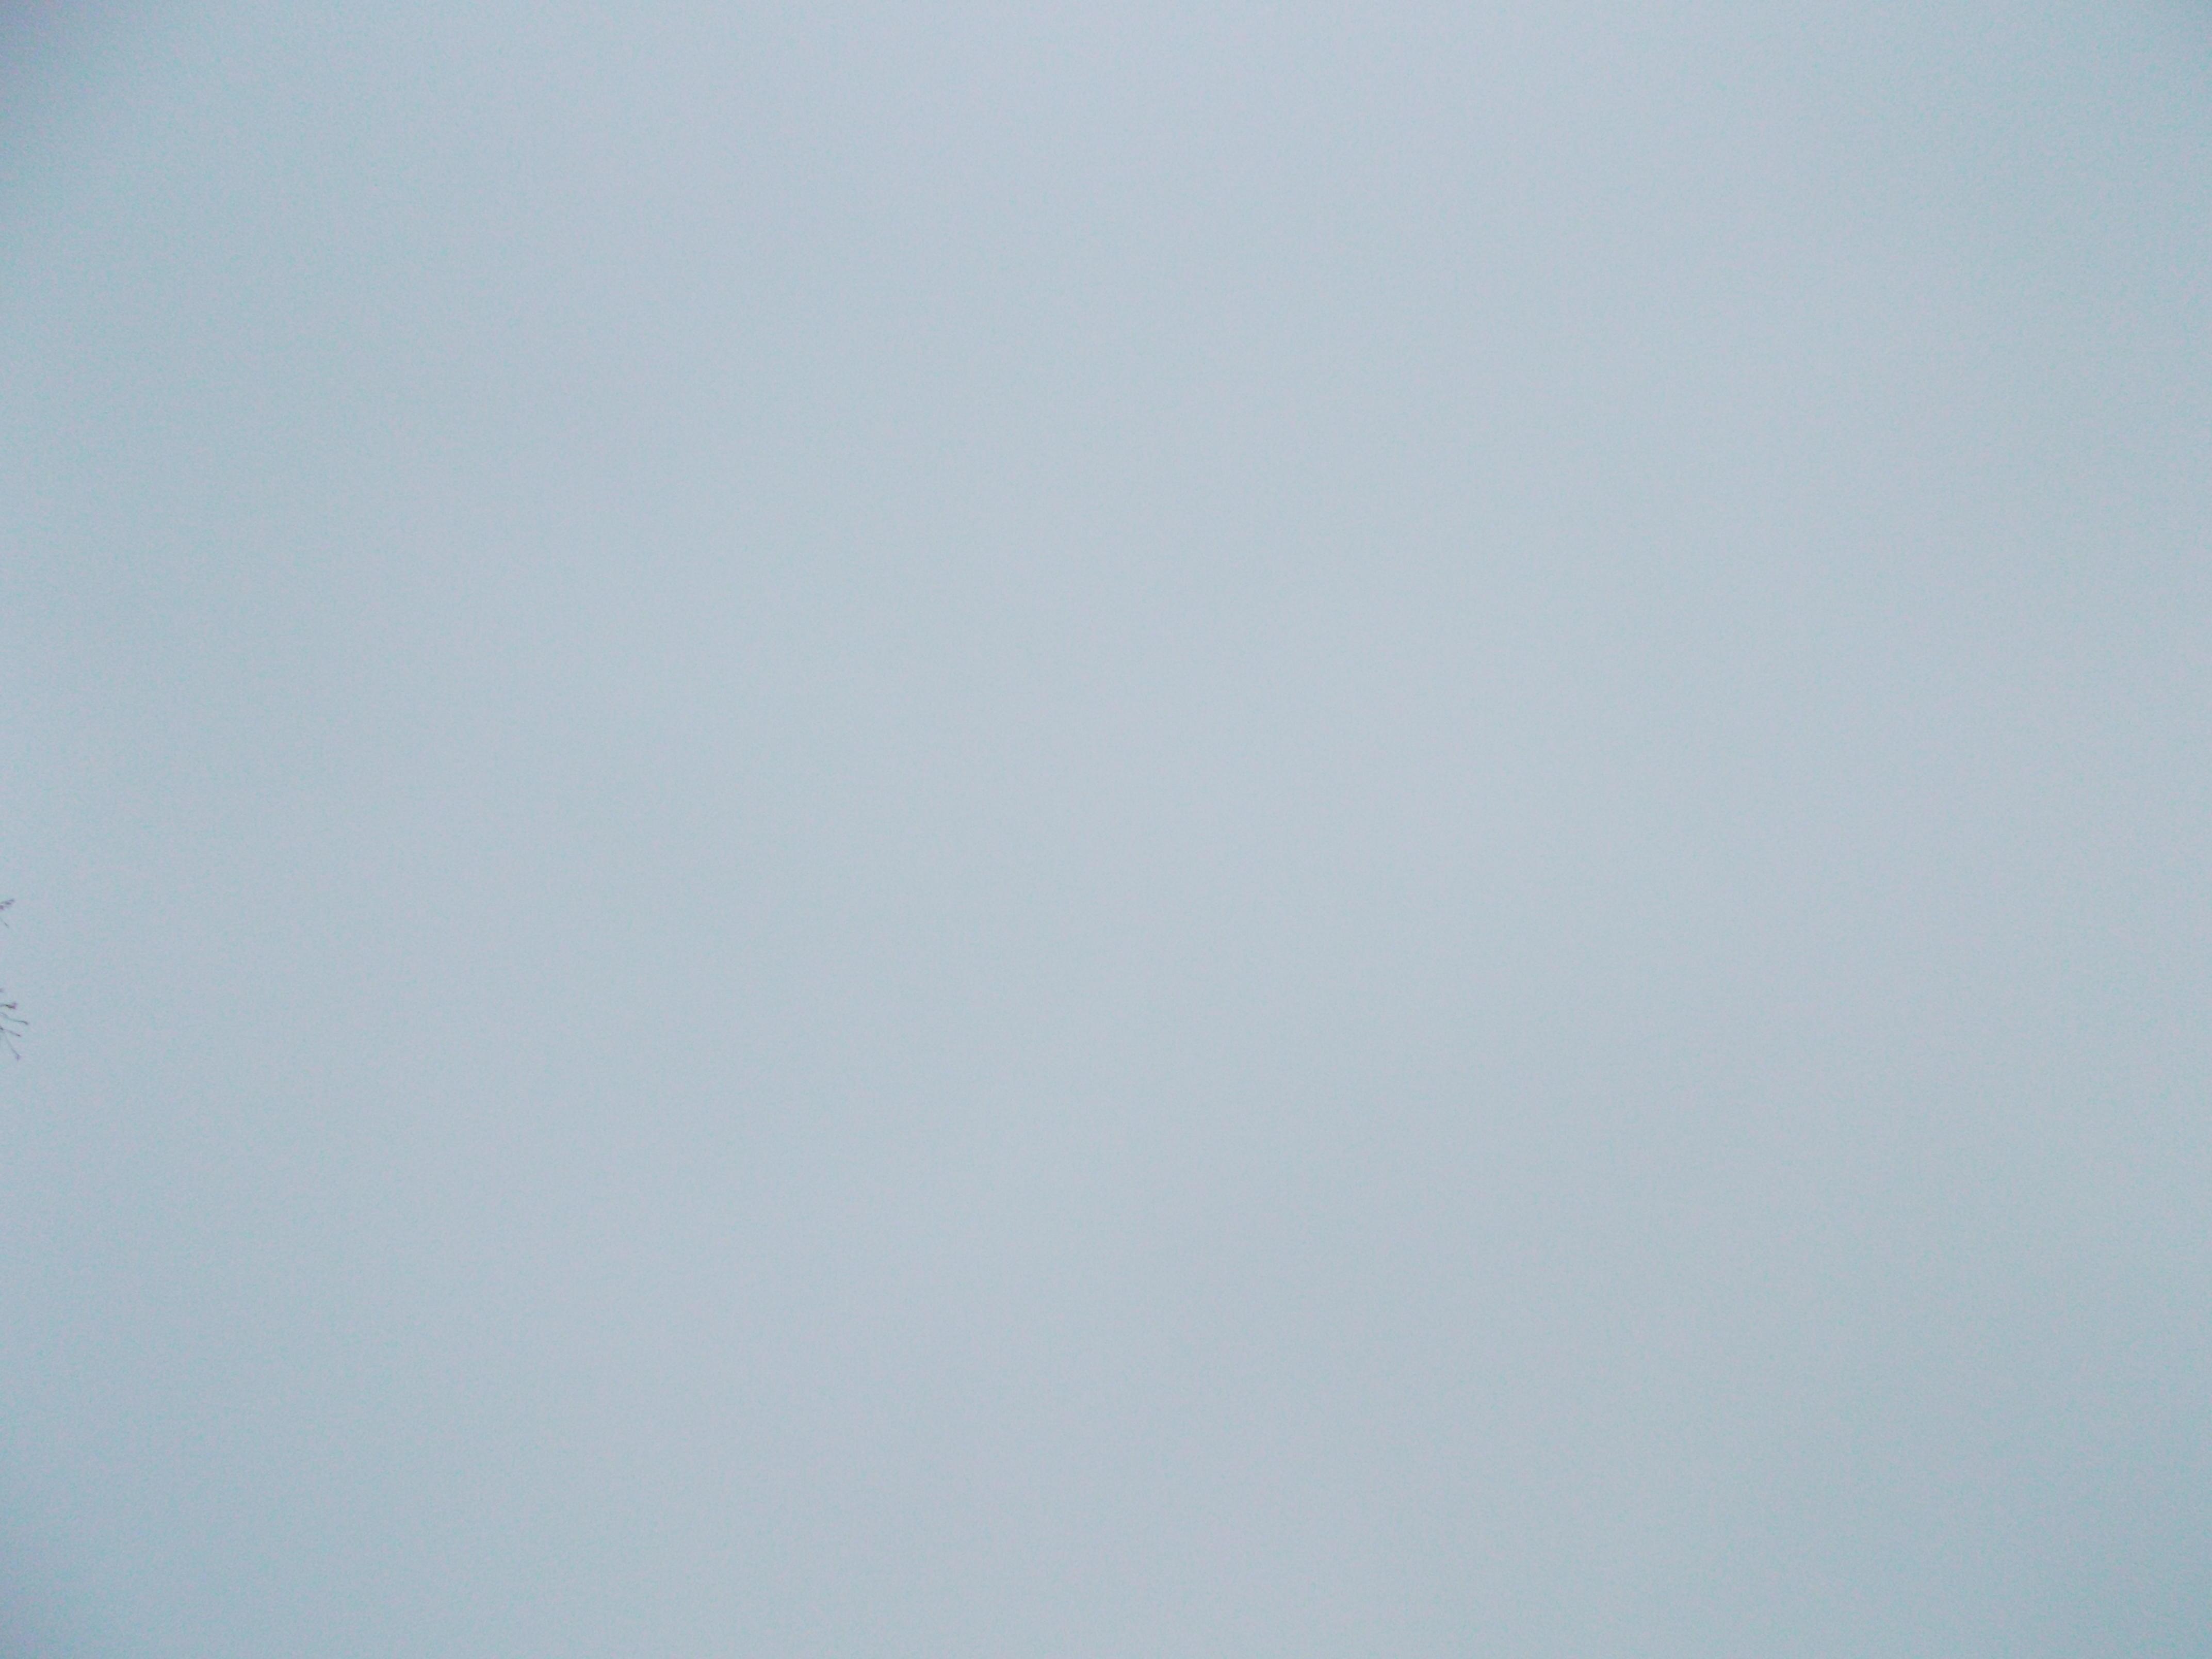 2013-01-07 Longitude -0.371 Latitude 49.182 Altitude 13 Heure 13h28